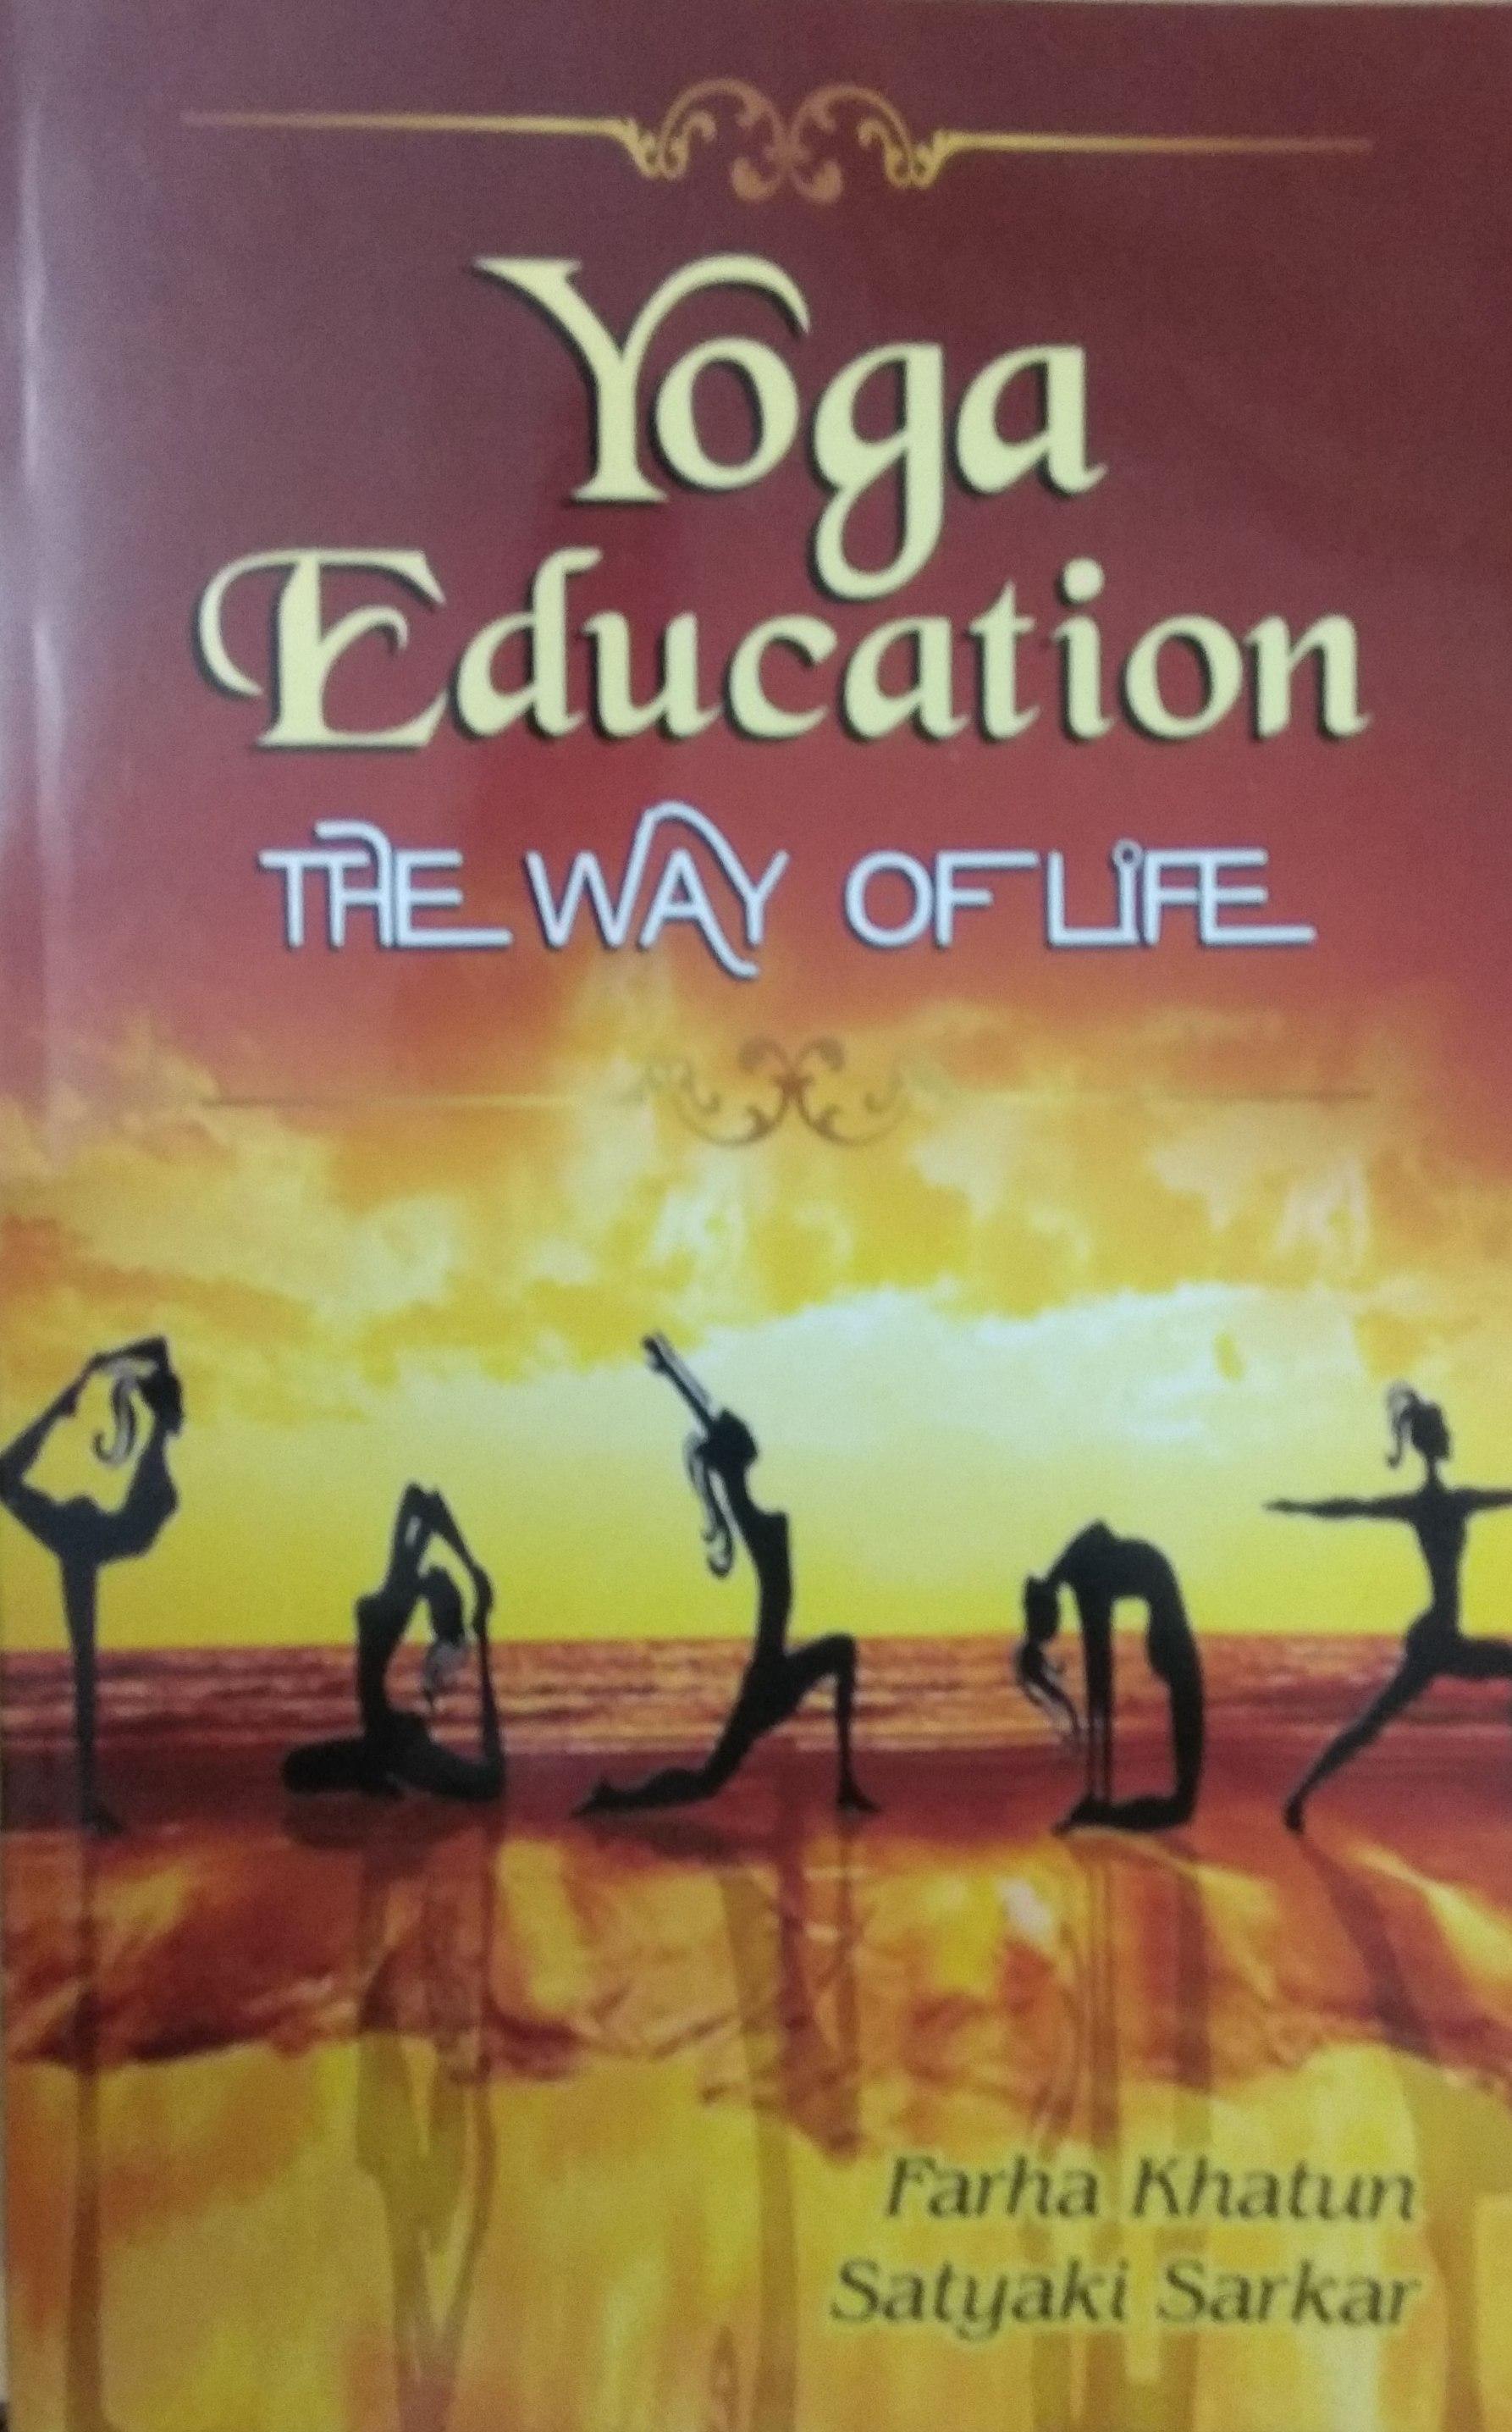 Yoga Education: The Way of Life